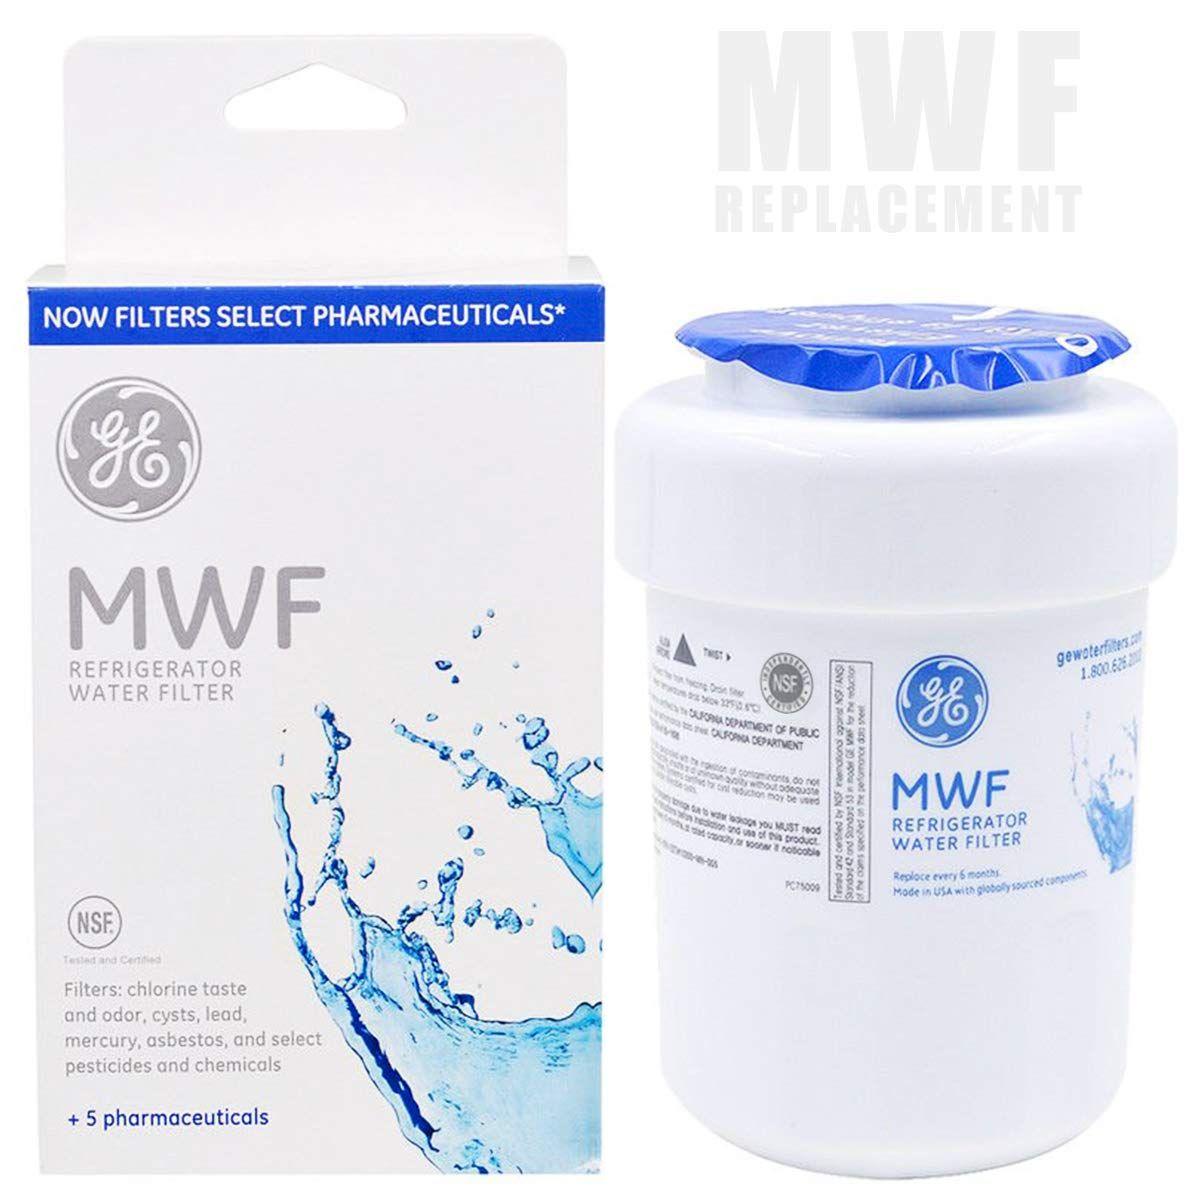 Ge Mwf Smart Refrigerator Water Filter Cartridge Ebulous Replacement Water Filter 1 Pack Mensw Refrigerator Water Filter Water Filter Cartridge Water Filter